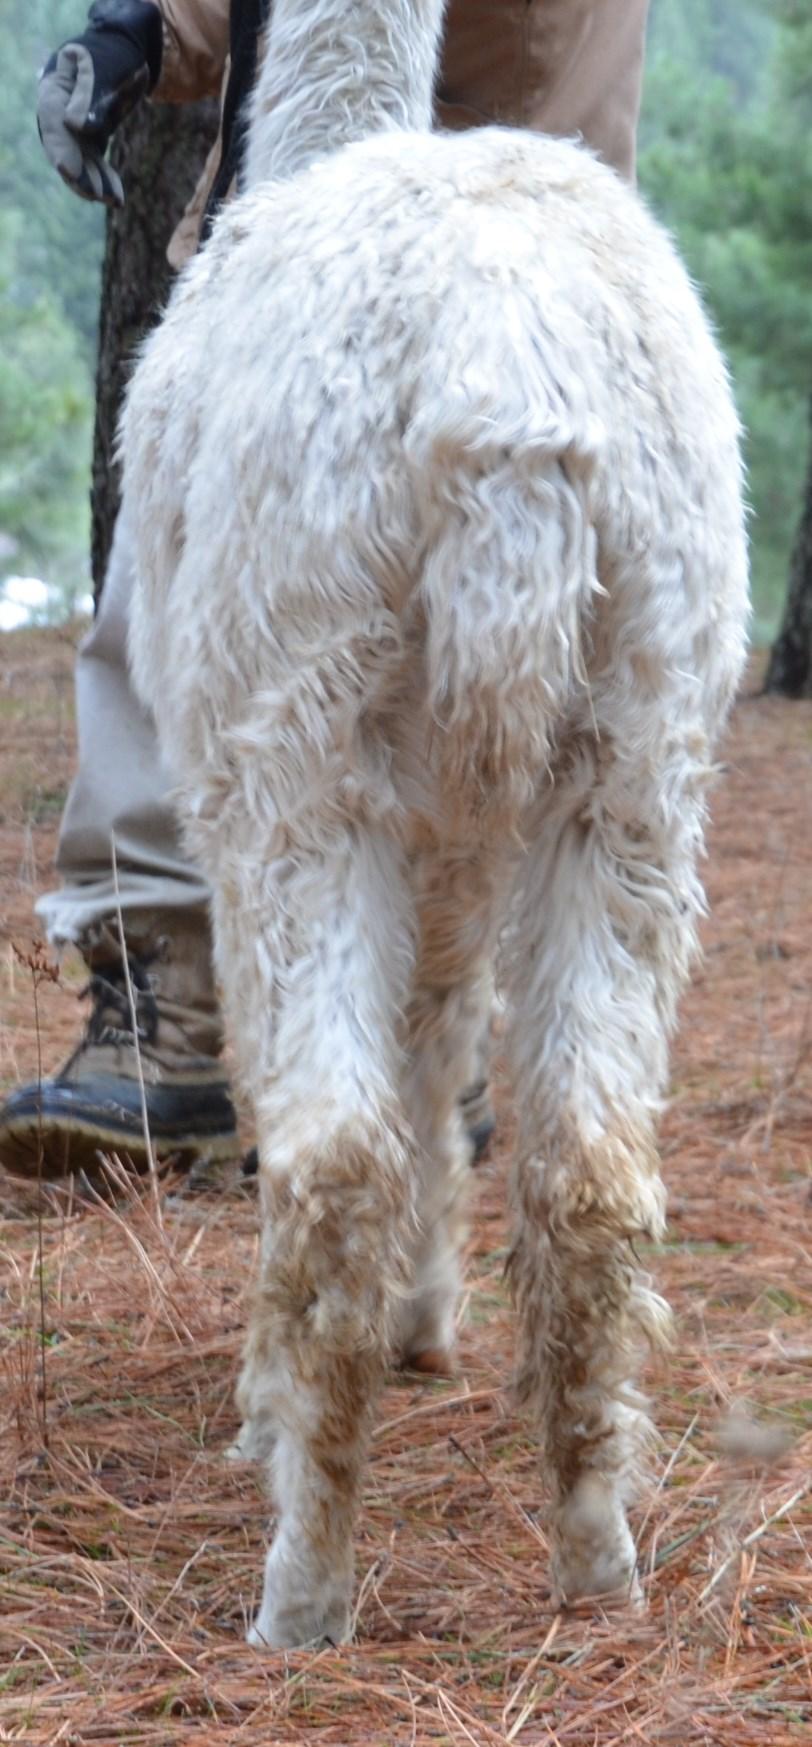 Legata rear legs